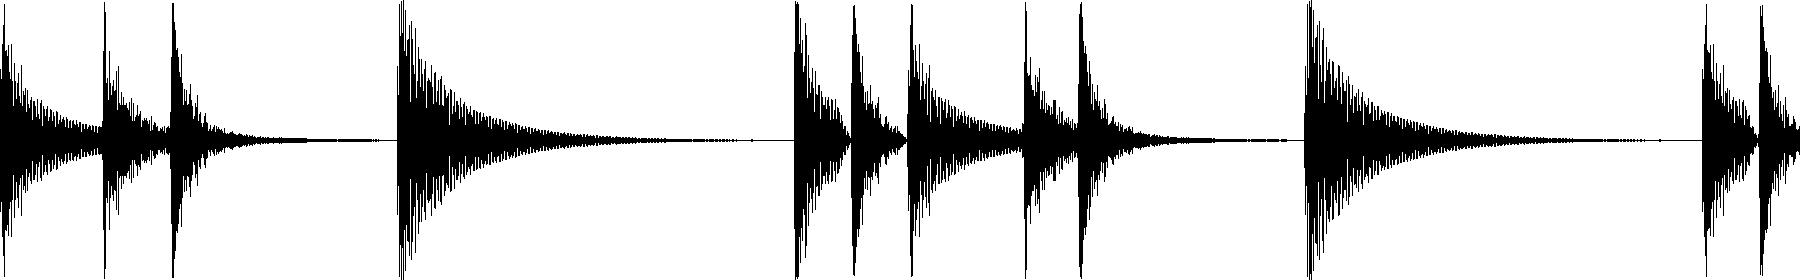 bluezone bc0210 percussion loop 026 110